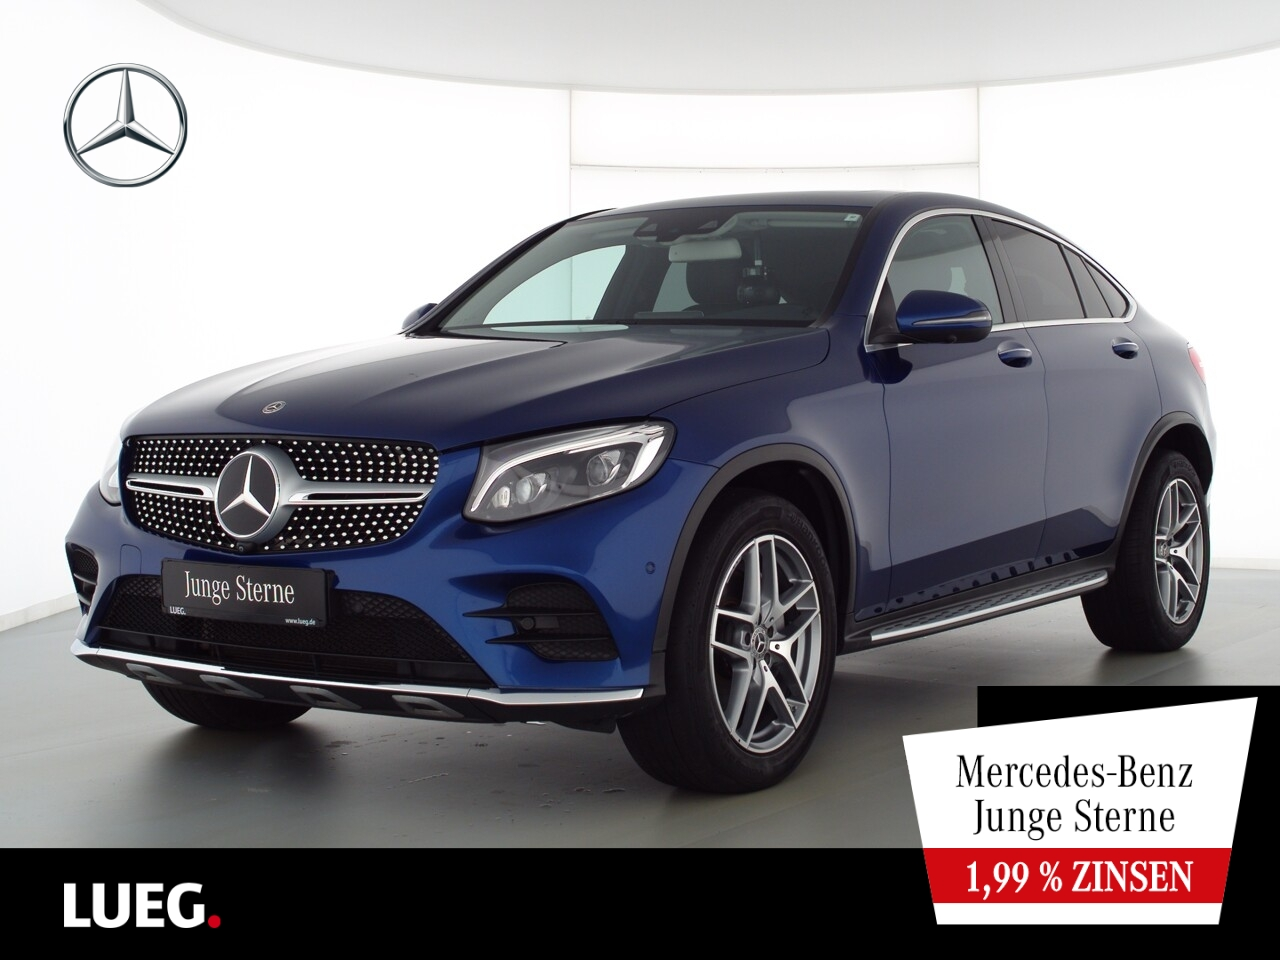 Mercedes-Benz GLC 250 d 4M Coupe AMG+COM+SHD+Burm+LED+AHK+360°, Jahr 2017, Diesel